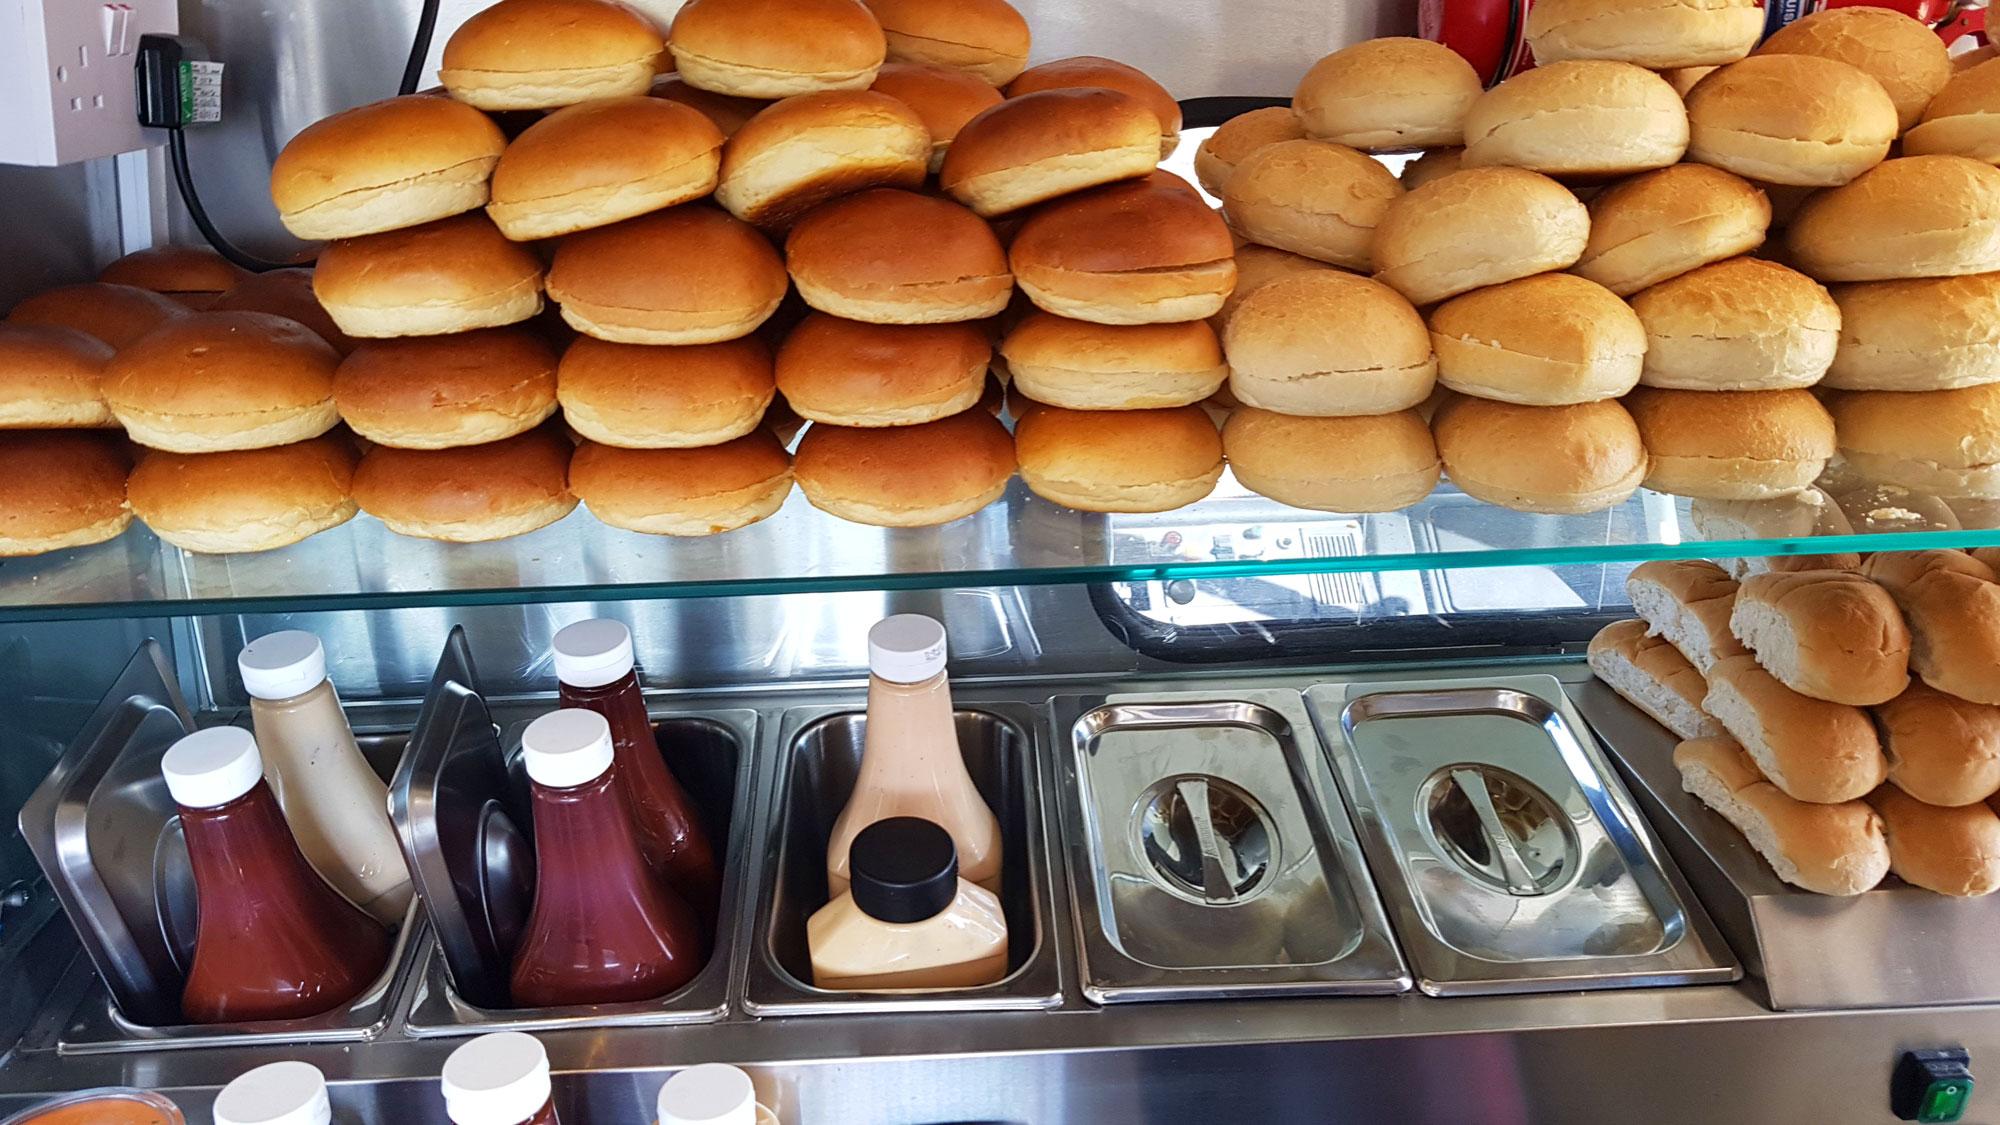 Buffet_bread_insidetruck_WR